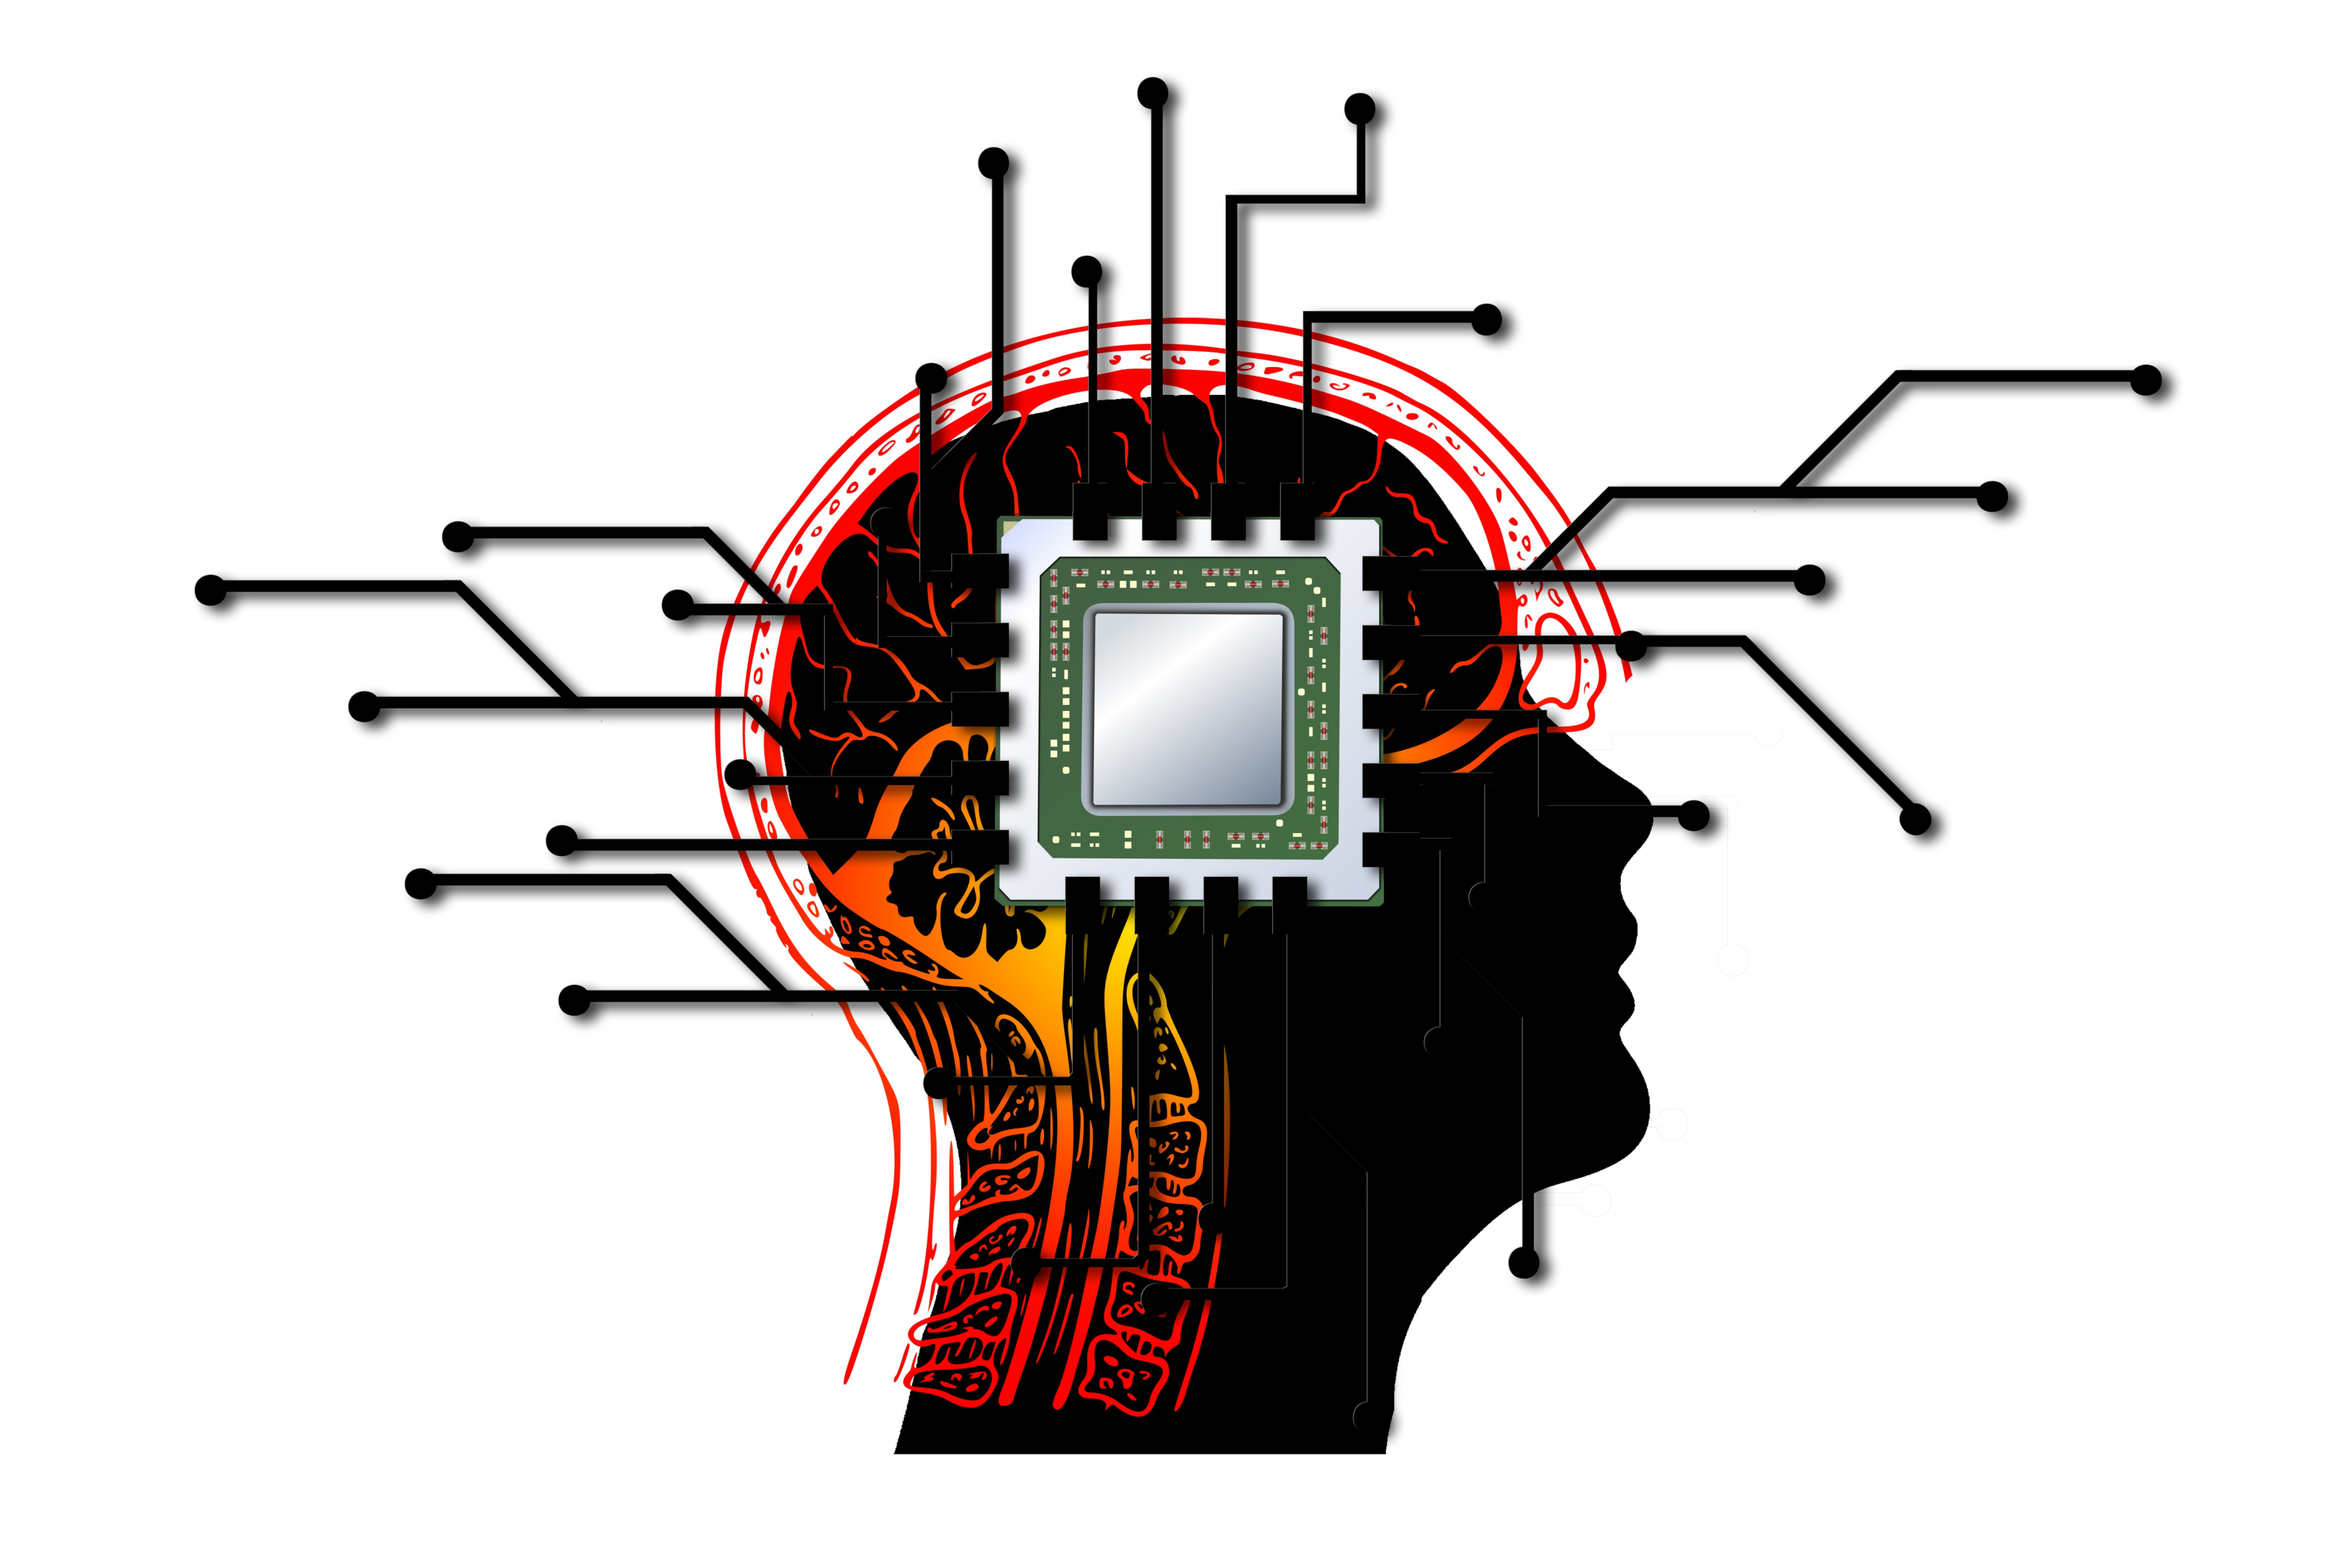 Intelligence Artificielle (Image by Gerd Altmann from Pixabay)